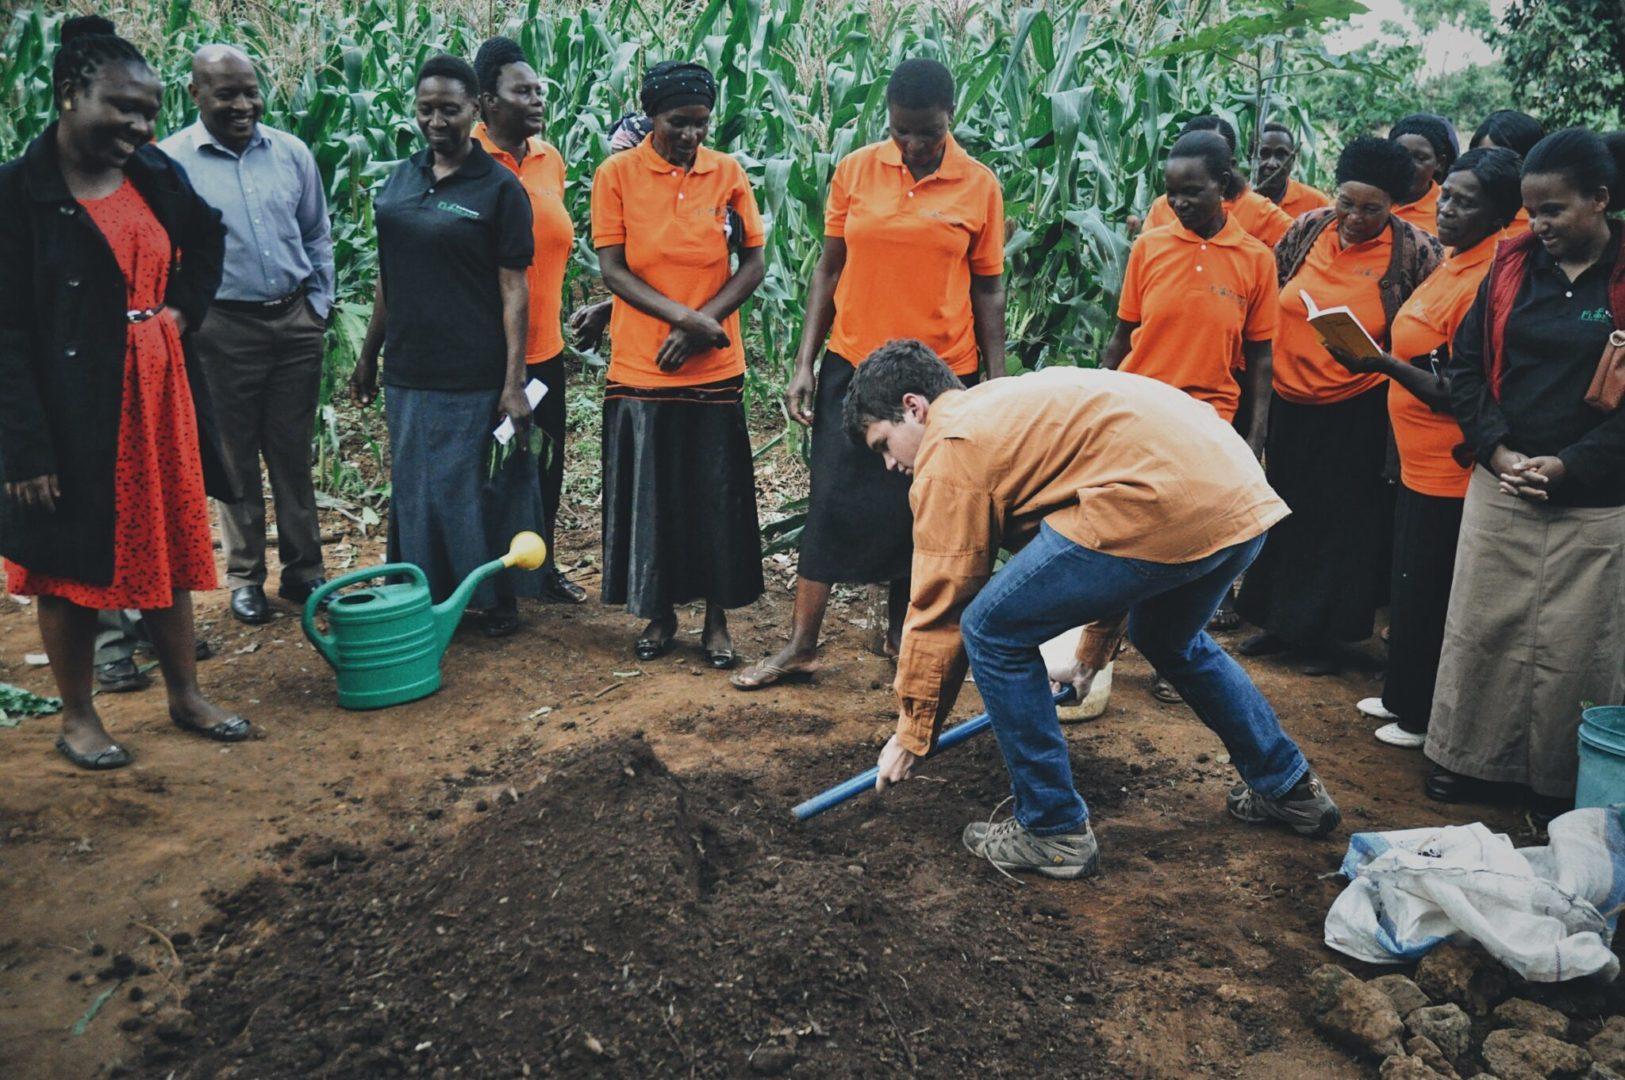 Preparing the soil for a sack garden